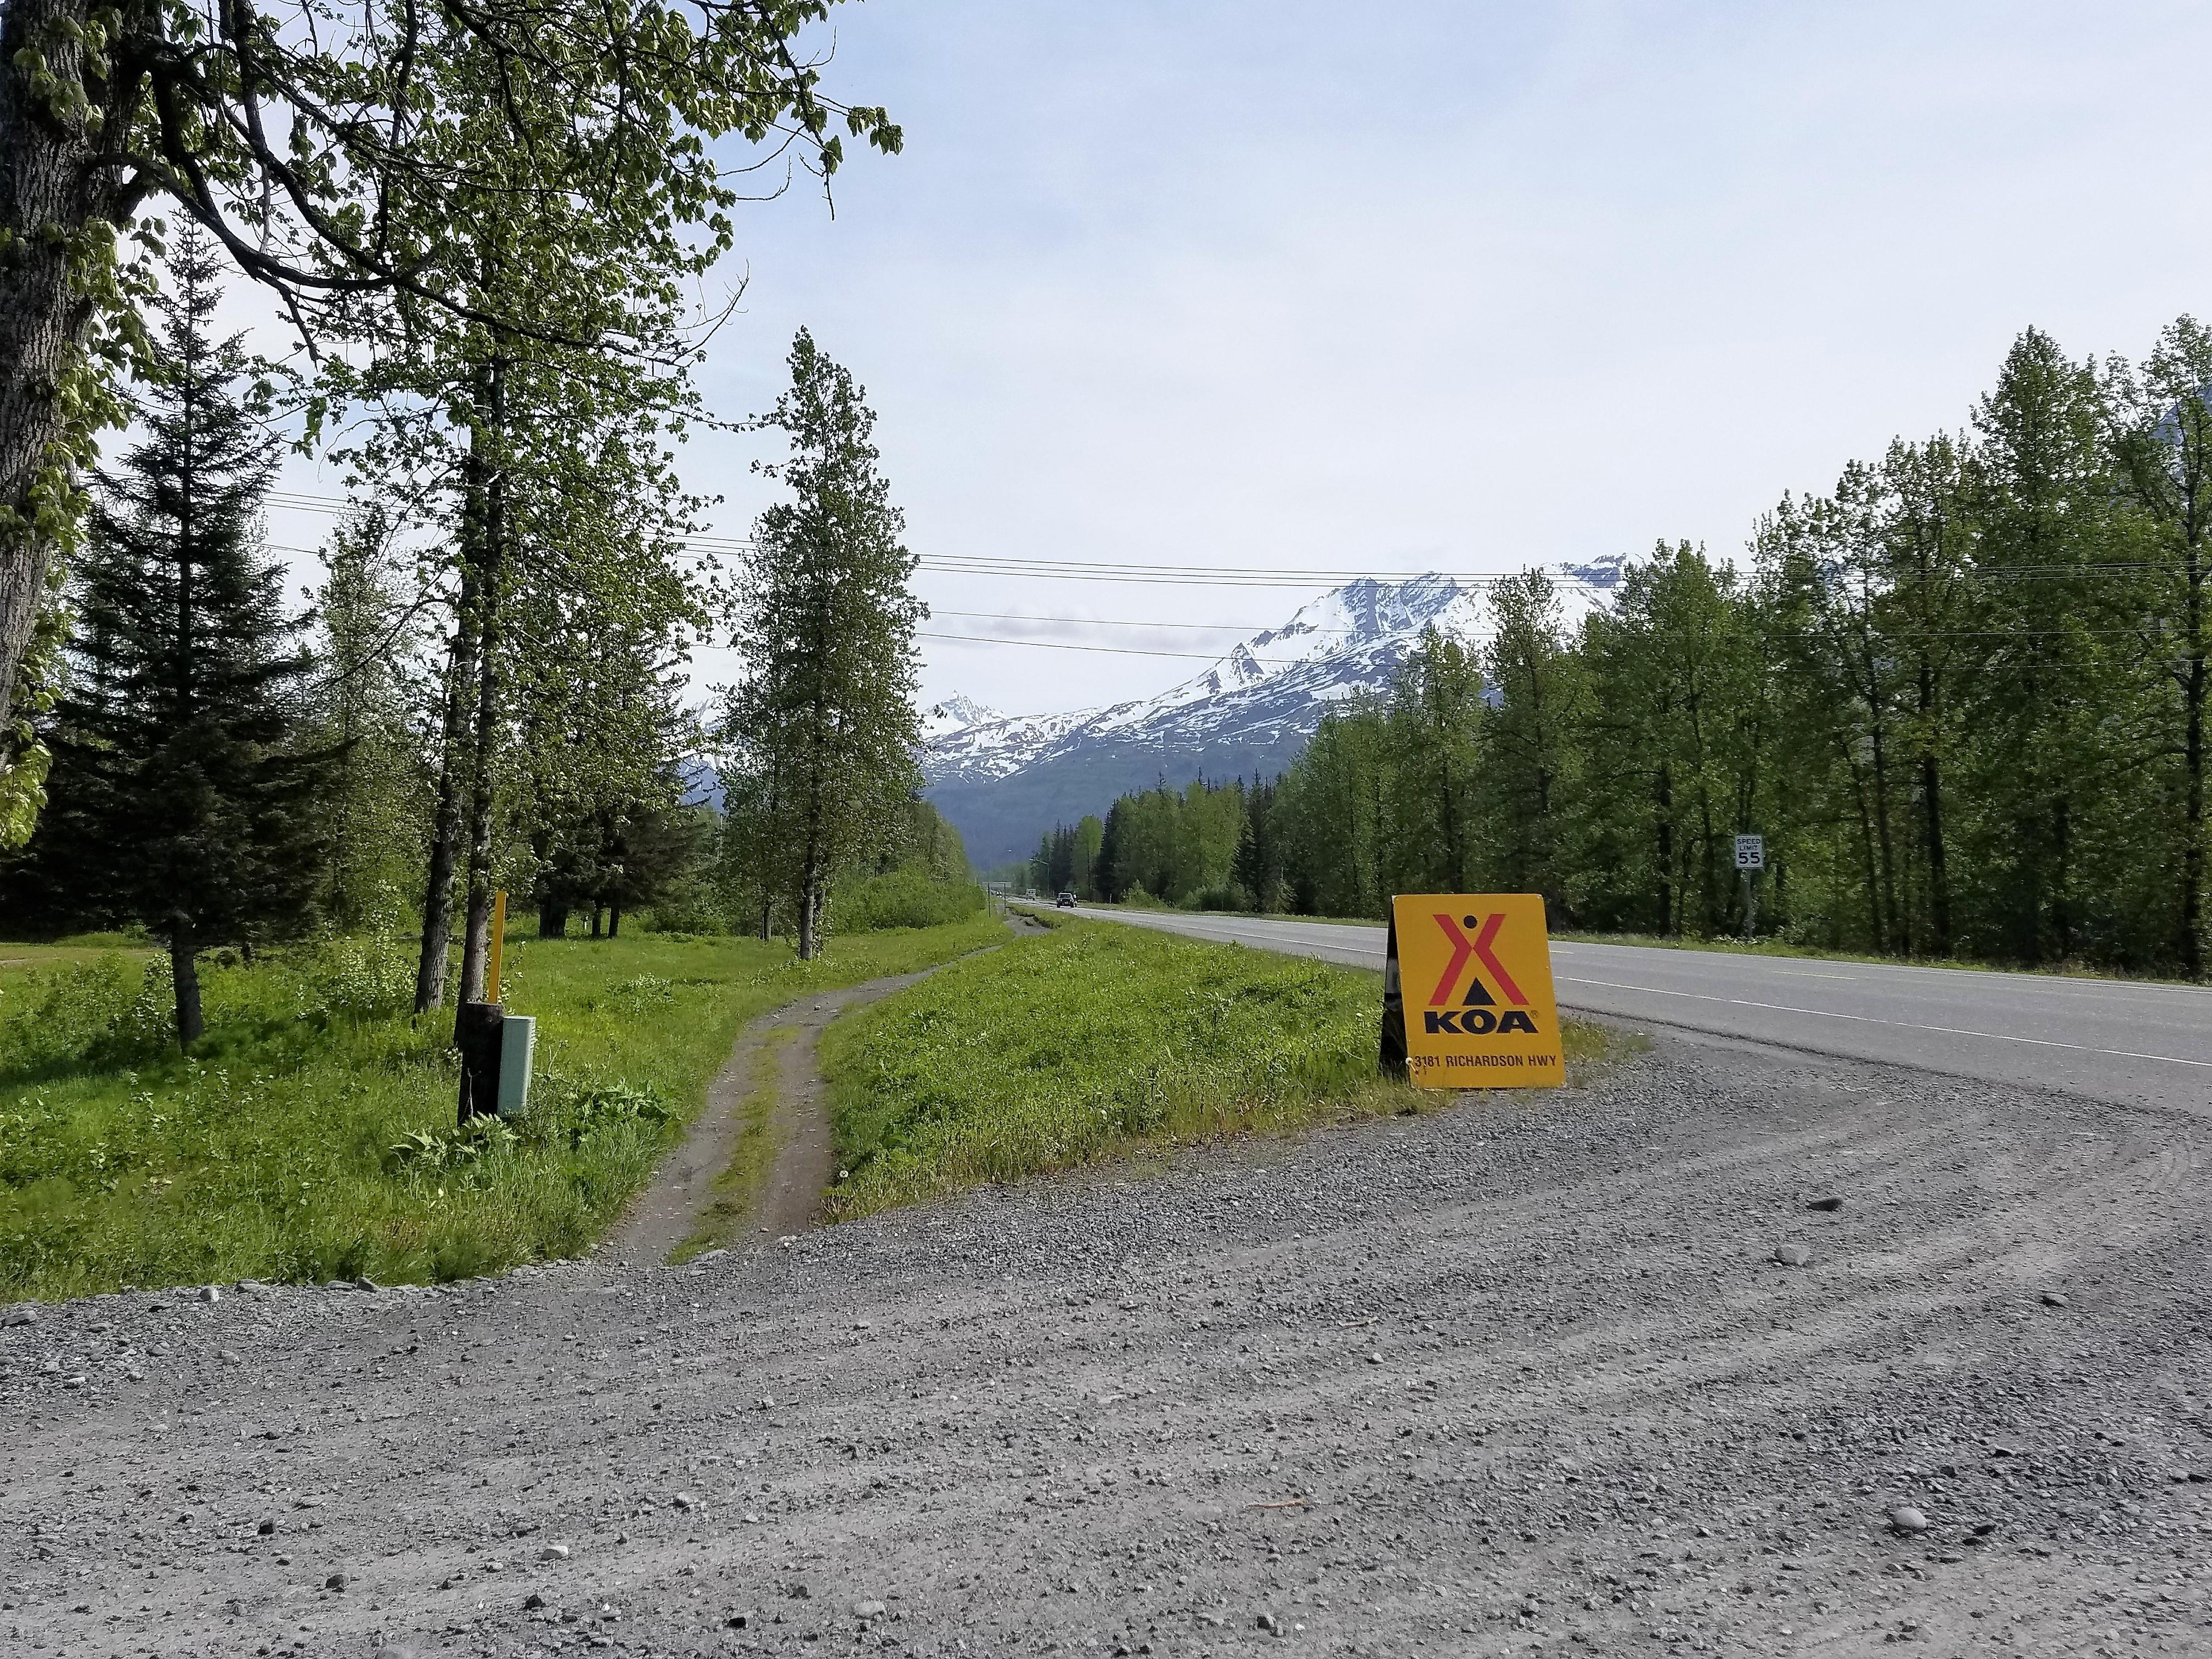 Valdez KOA Journey